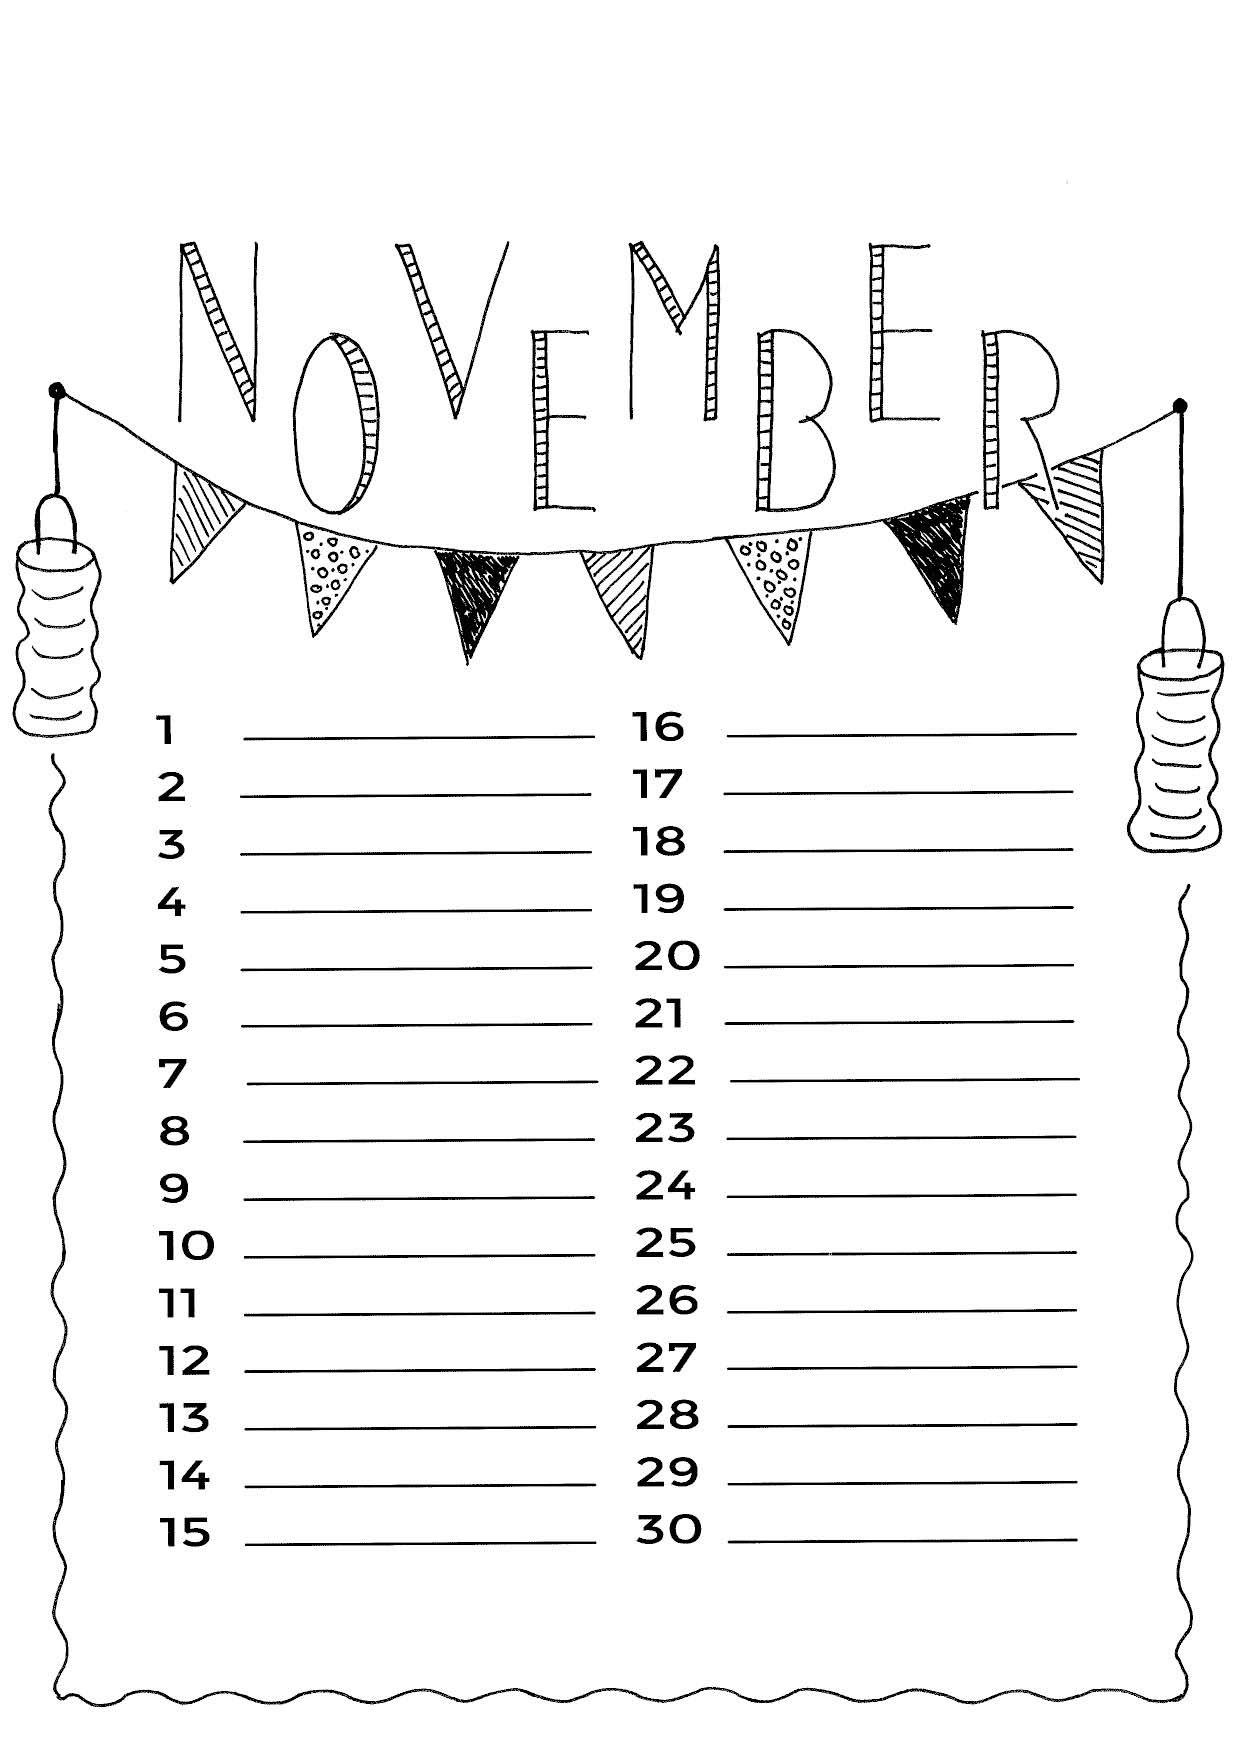 November Kalender Ideeen Kalender Verjaardagskalender